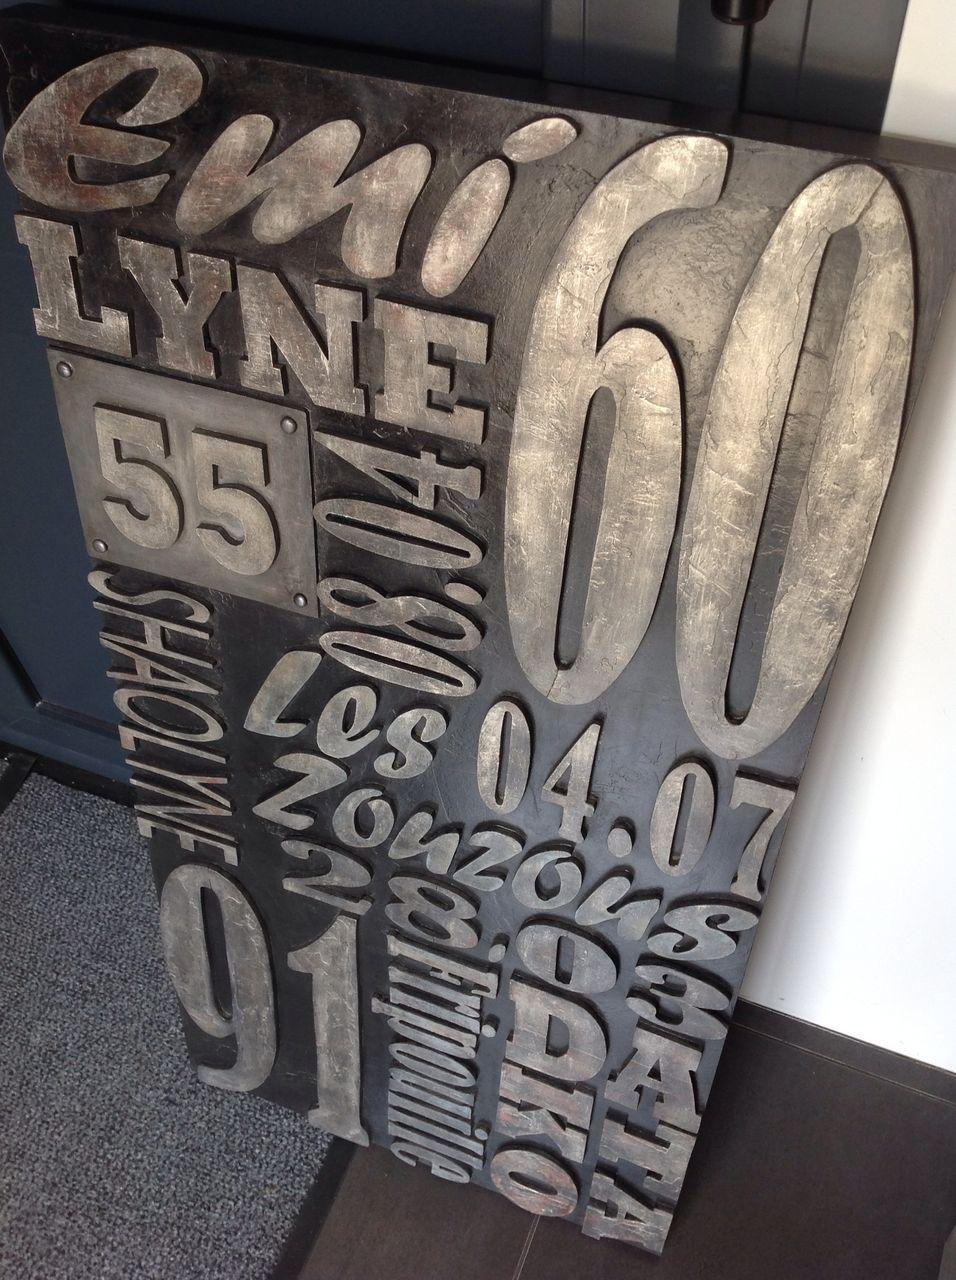 style industriel lettres bois type lettres imprimerie tableau personnaliser d coration mural. Black Bedroom Furniture Sets. Home Design Ideas